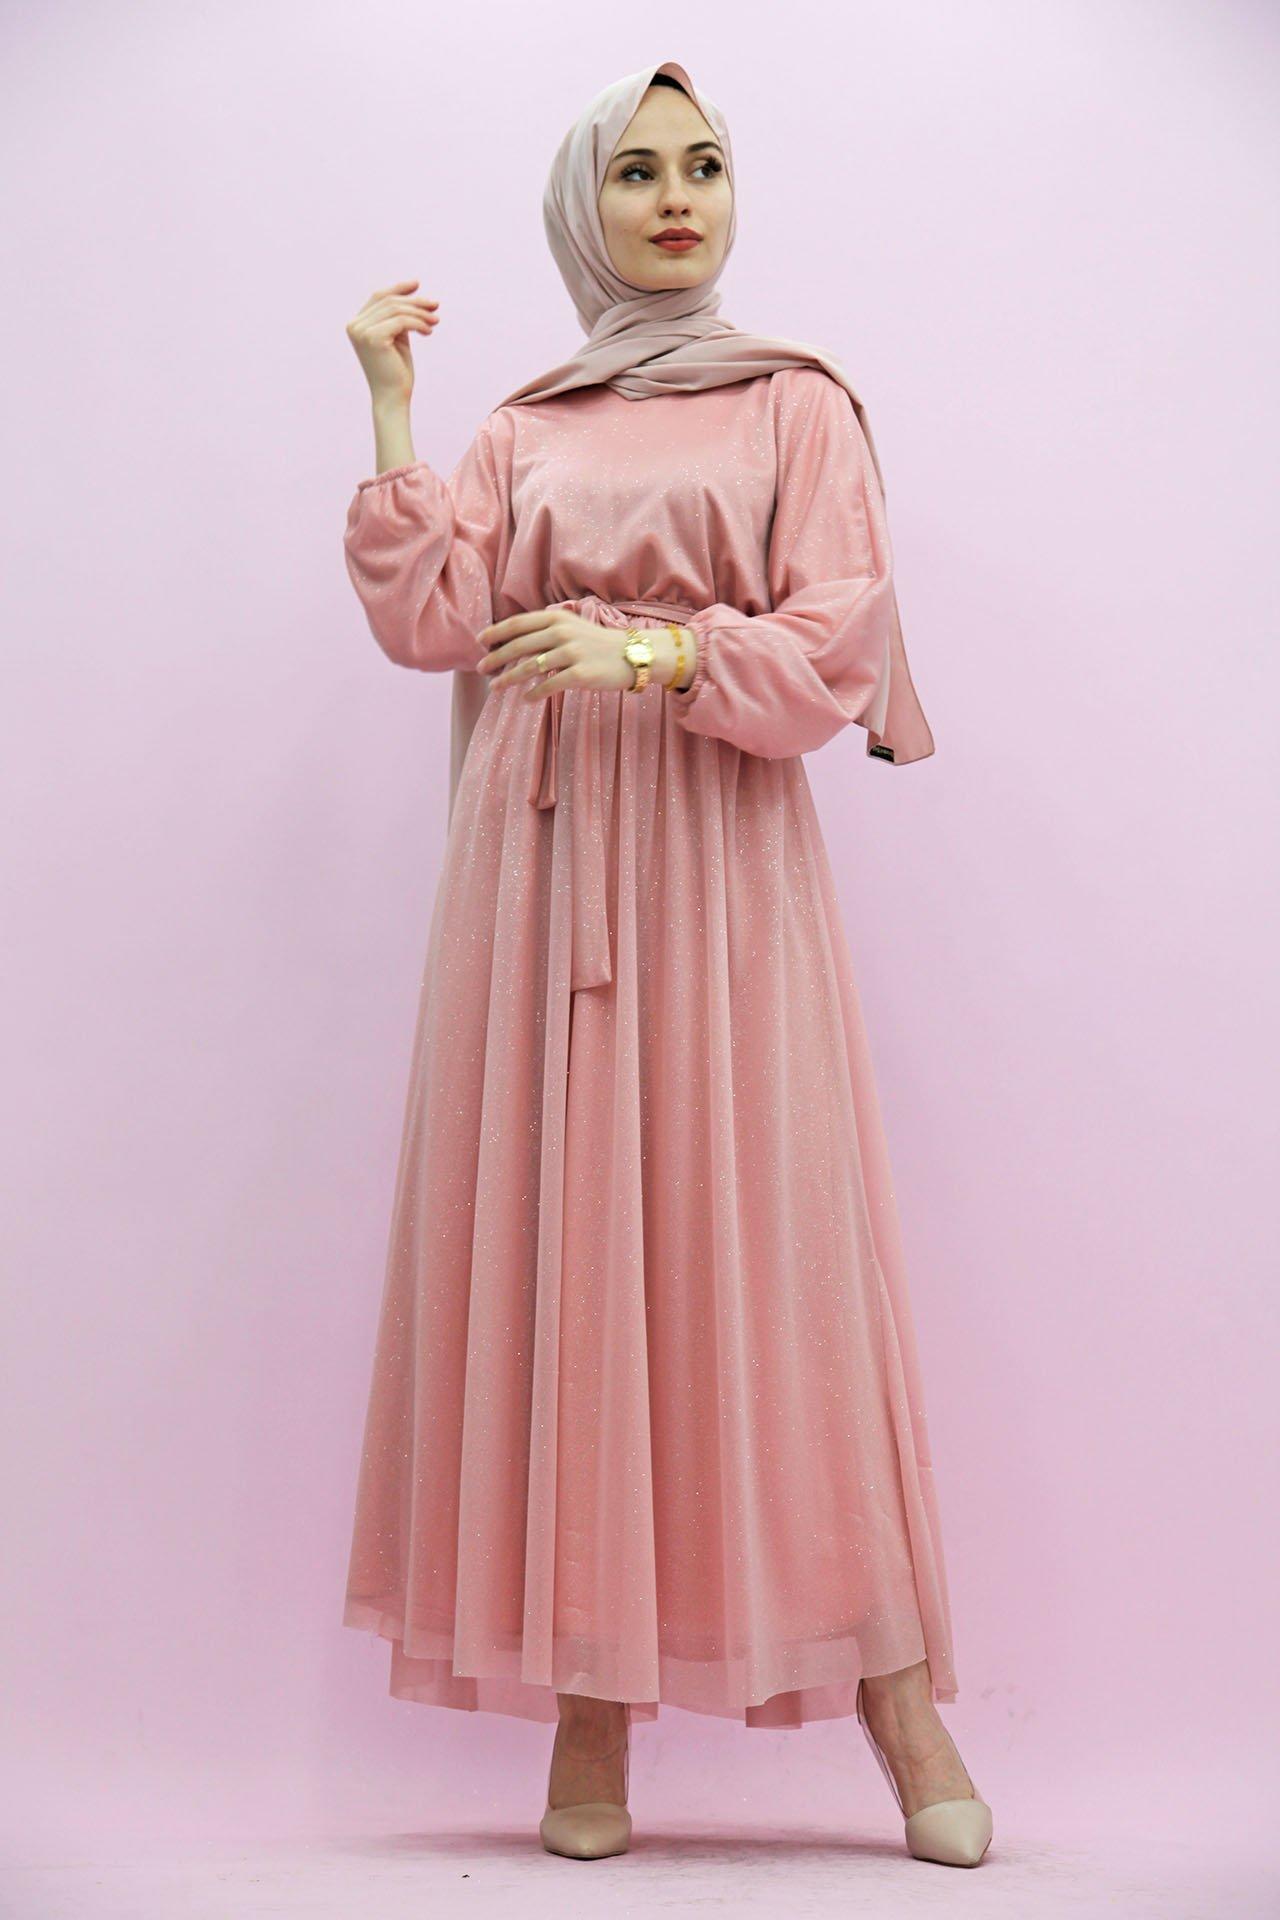 GİZAGİYİM - Simli Şifon Elbise Yavruağzı